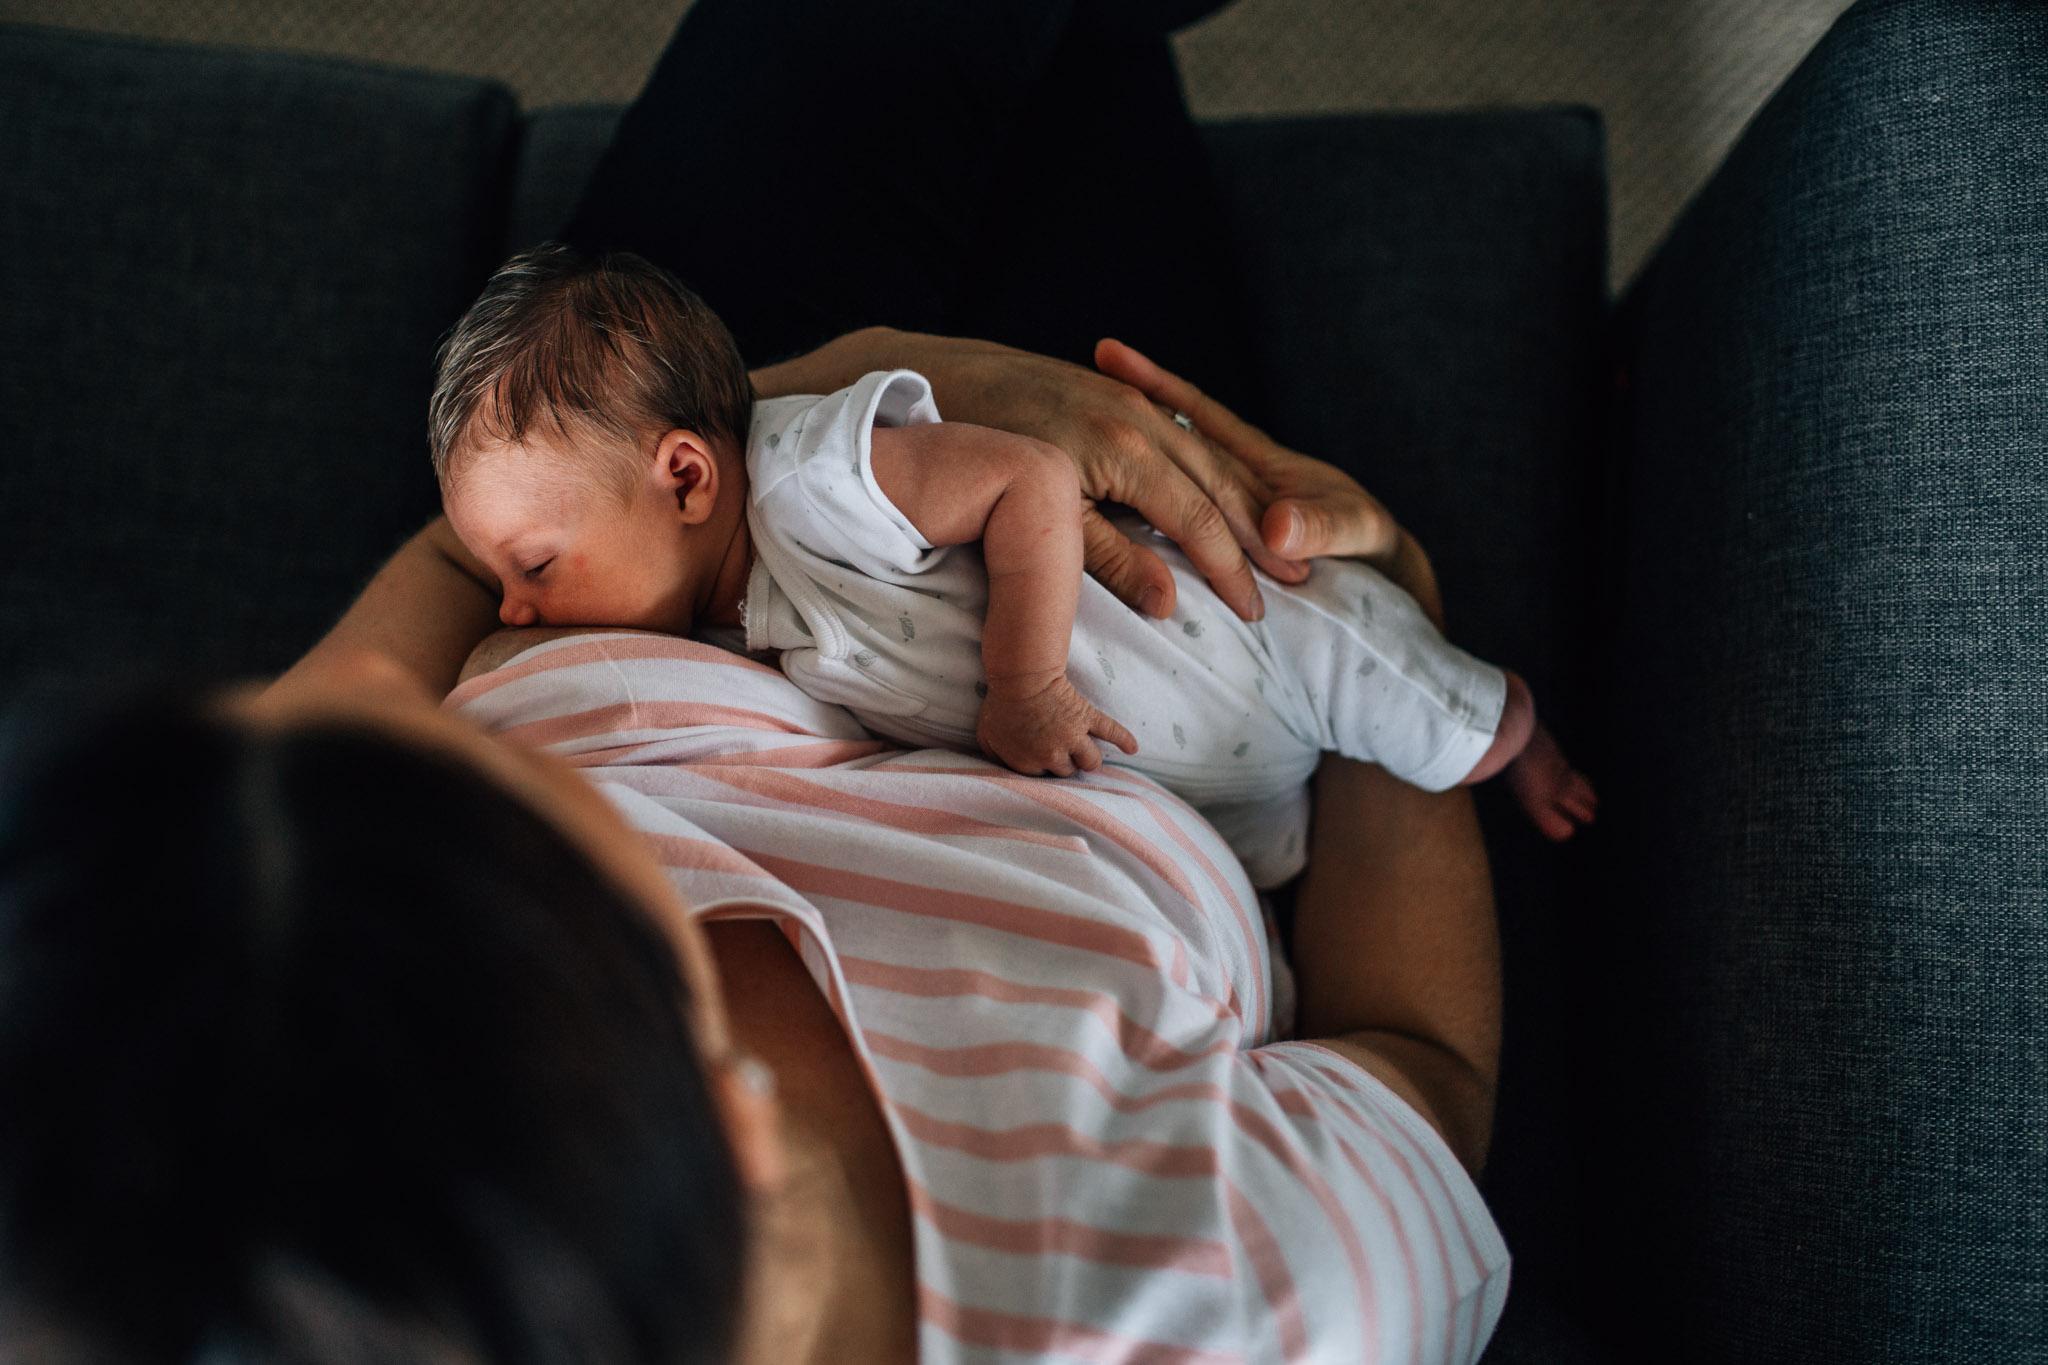 baby-breastfeeding-on-grey-sofa (1 of 1).jpg